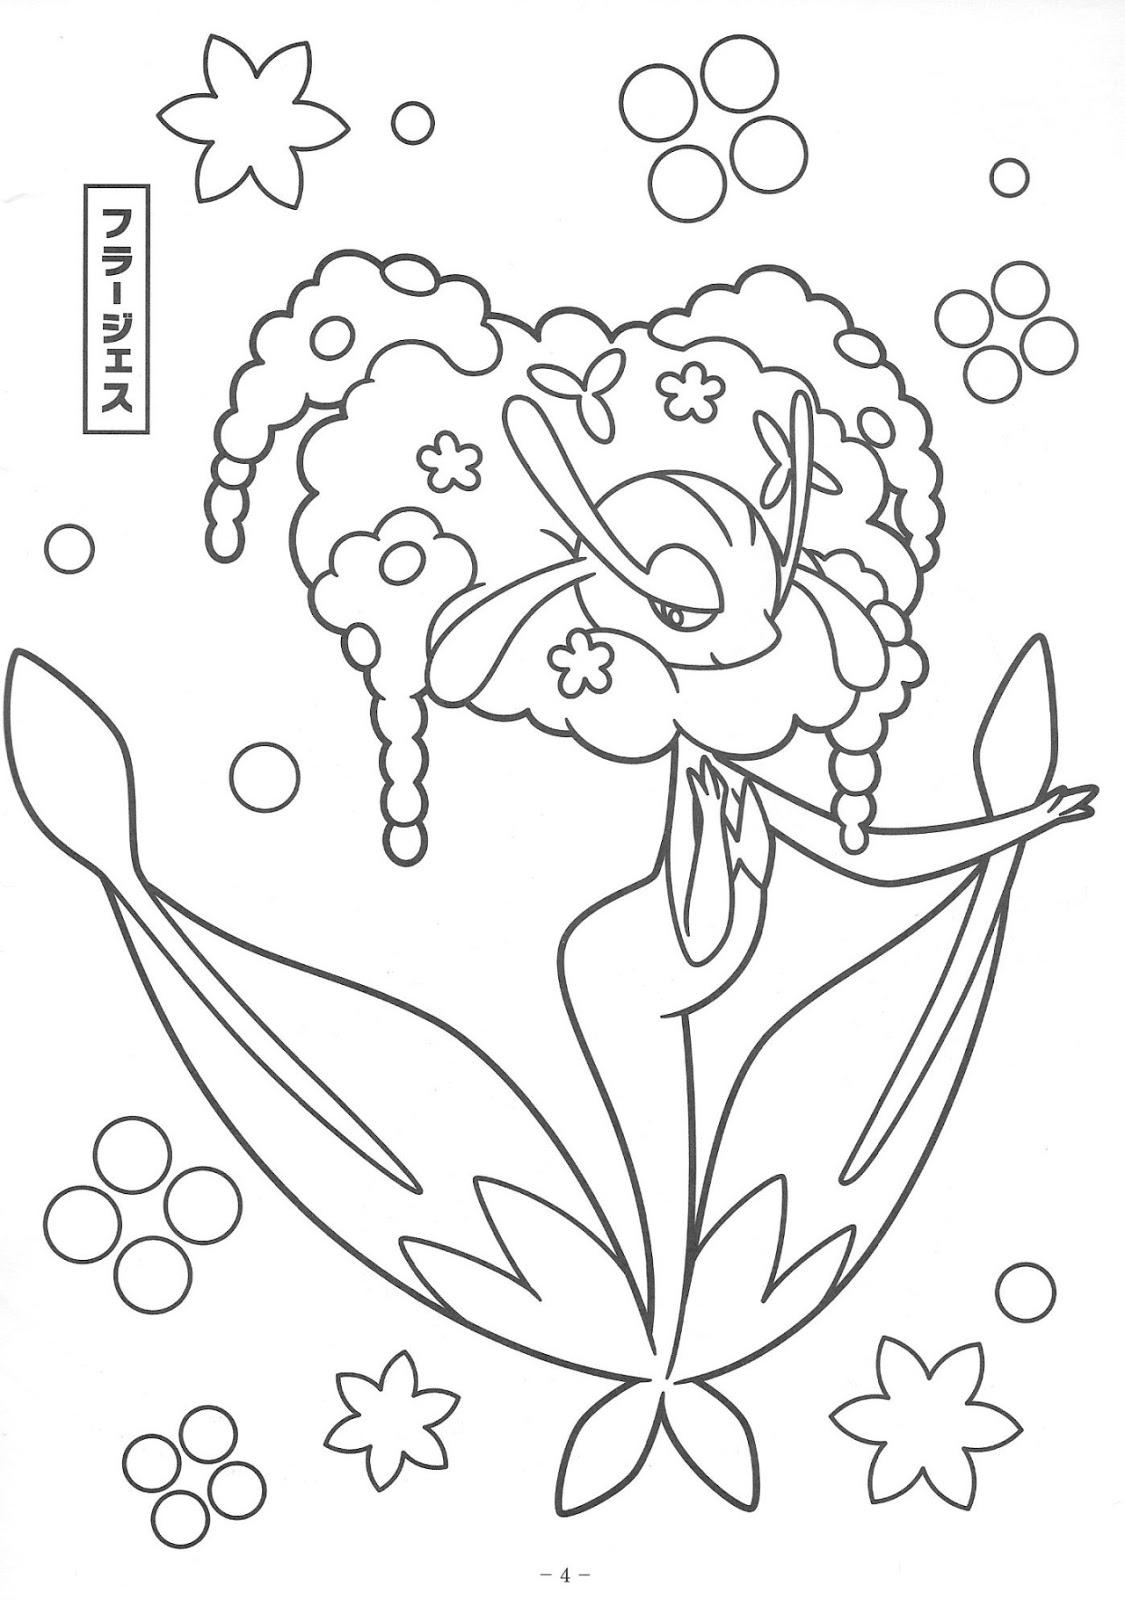 desenhos para colorir pokemon lendarios desenhos do pokemon para